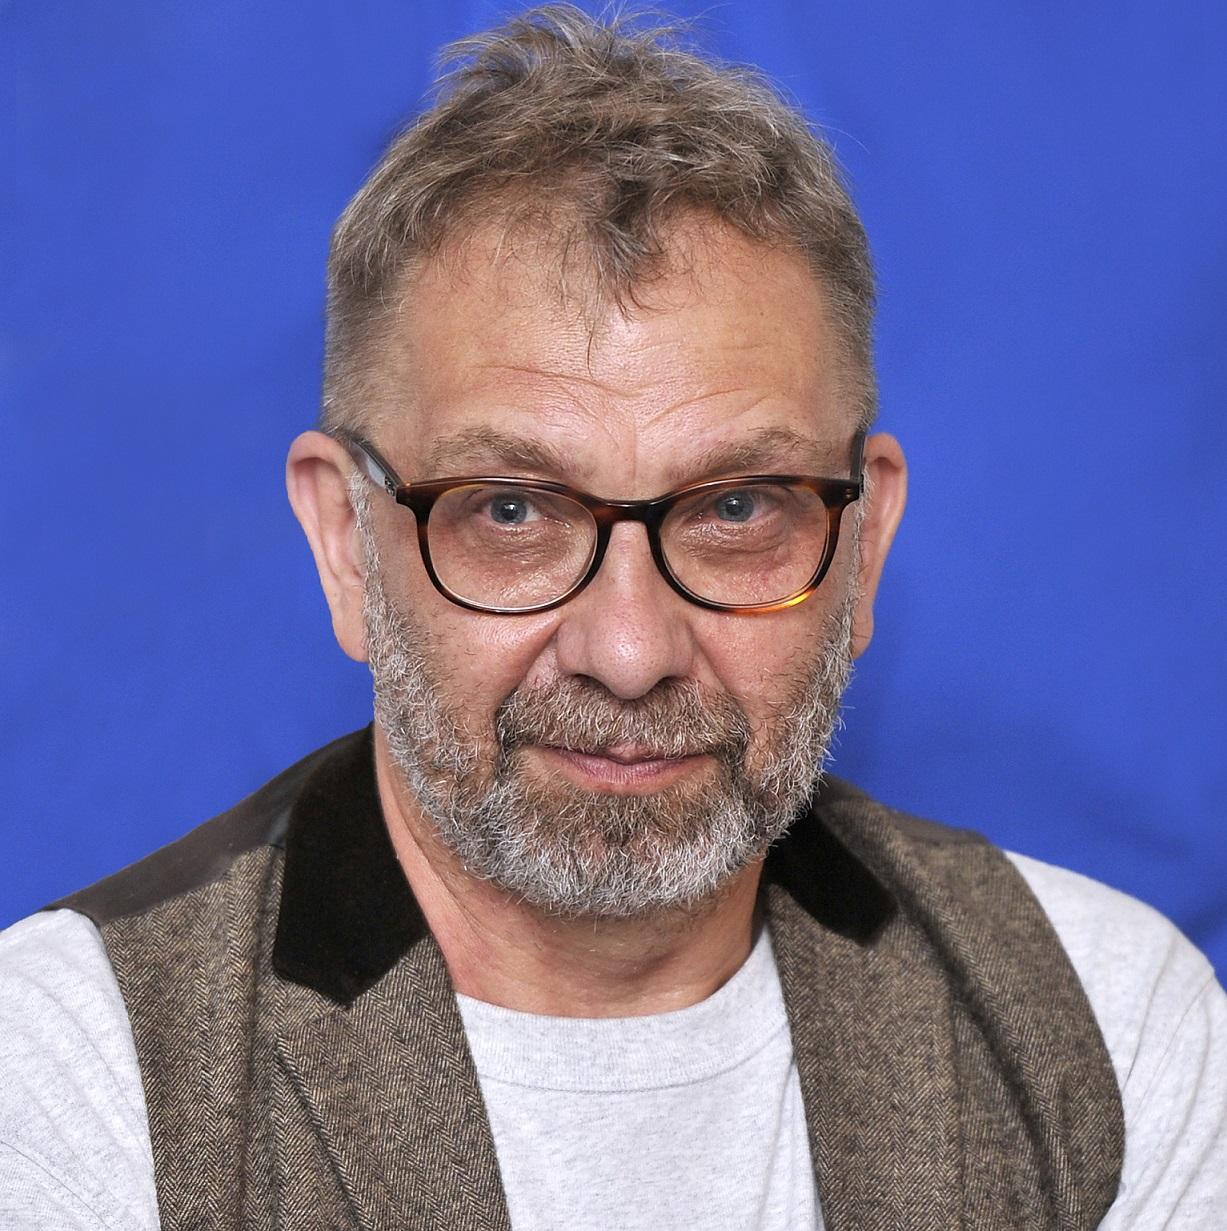 Piotr Metz żegna się z Radiem Trójka.